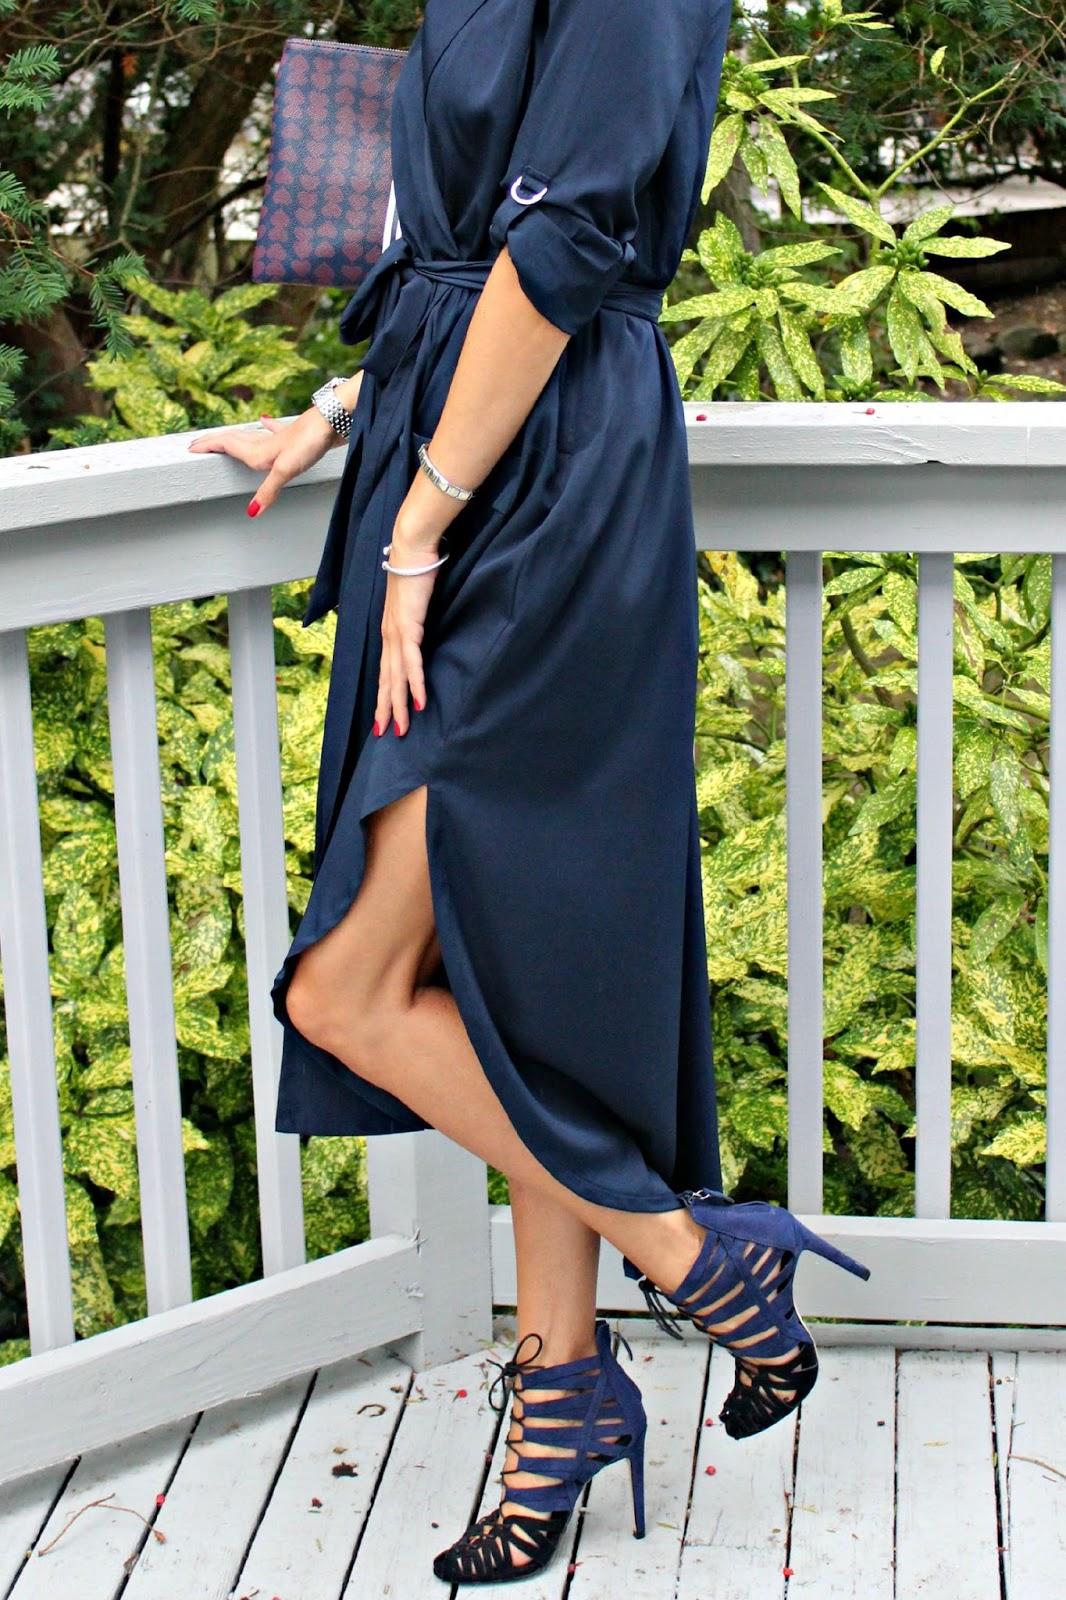 zara lace up colorblock heels